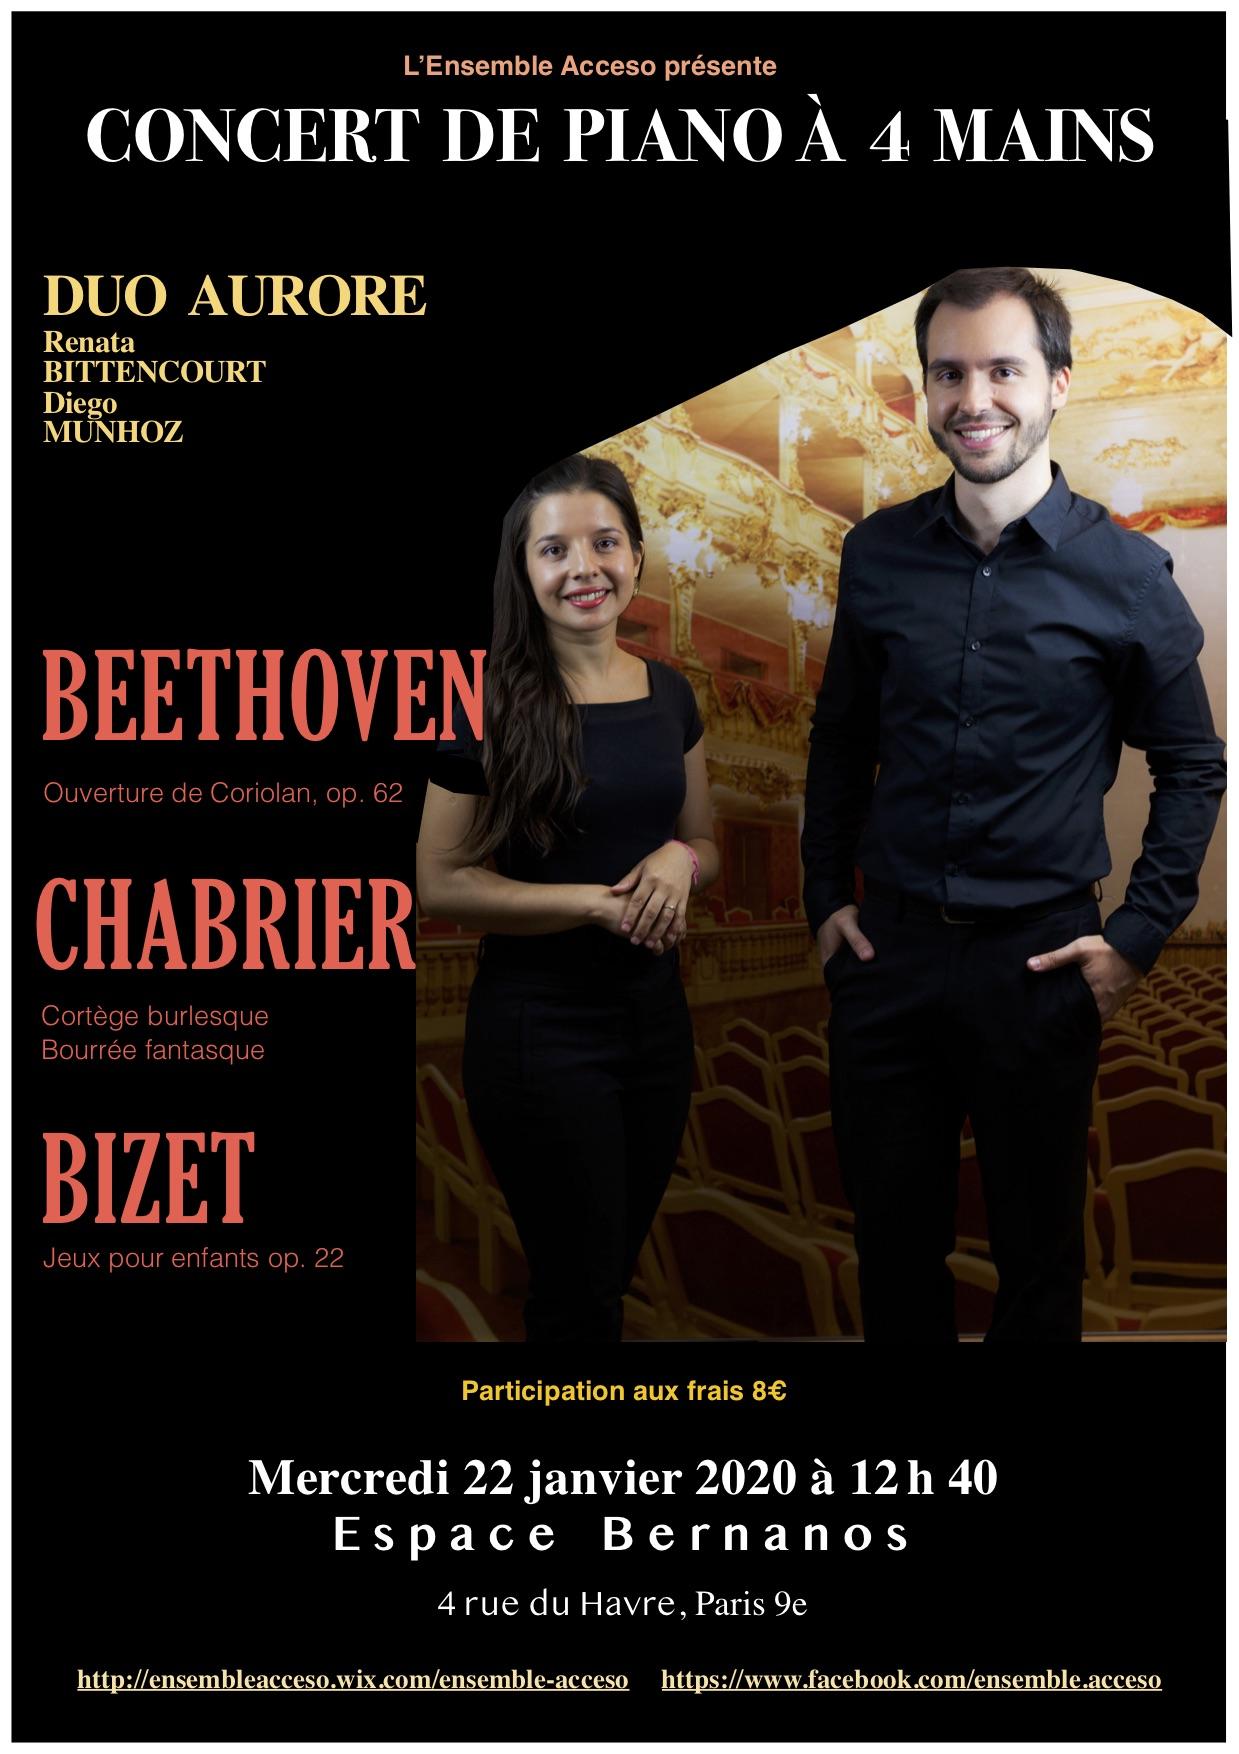 Affiche concert 22 janvier 2020 Duo Auro